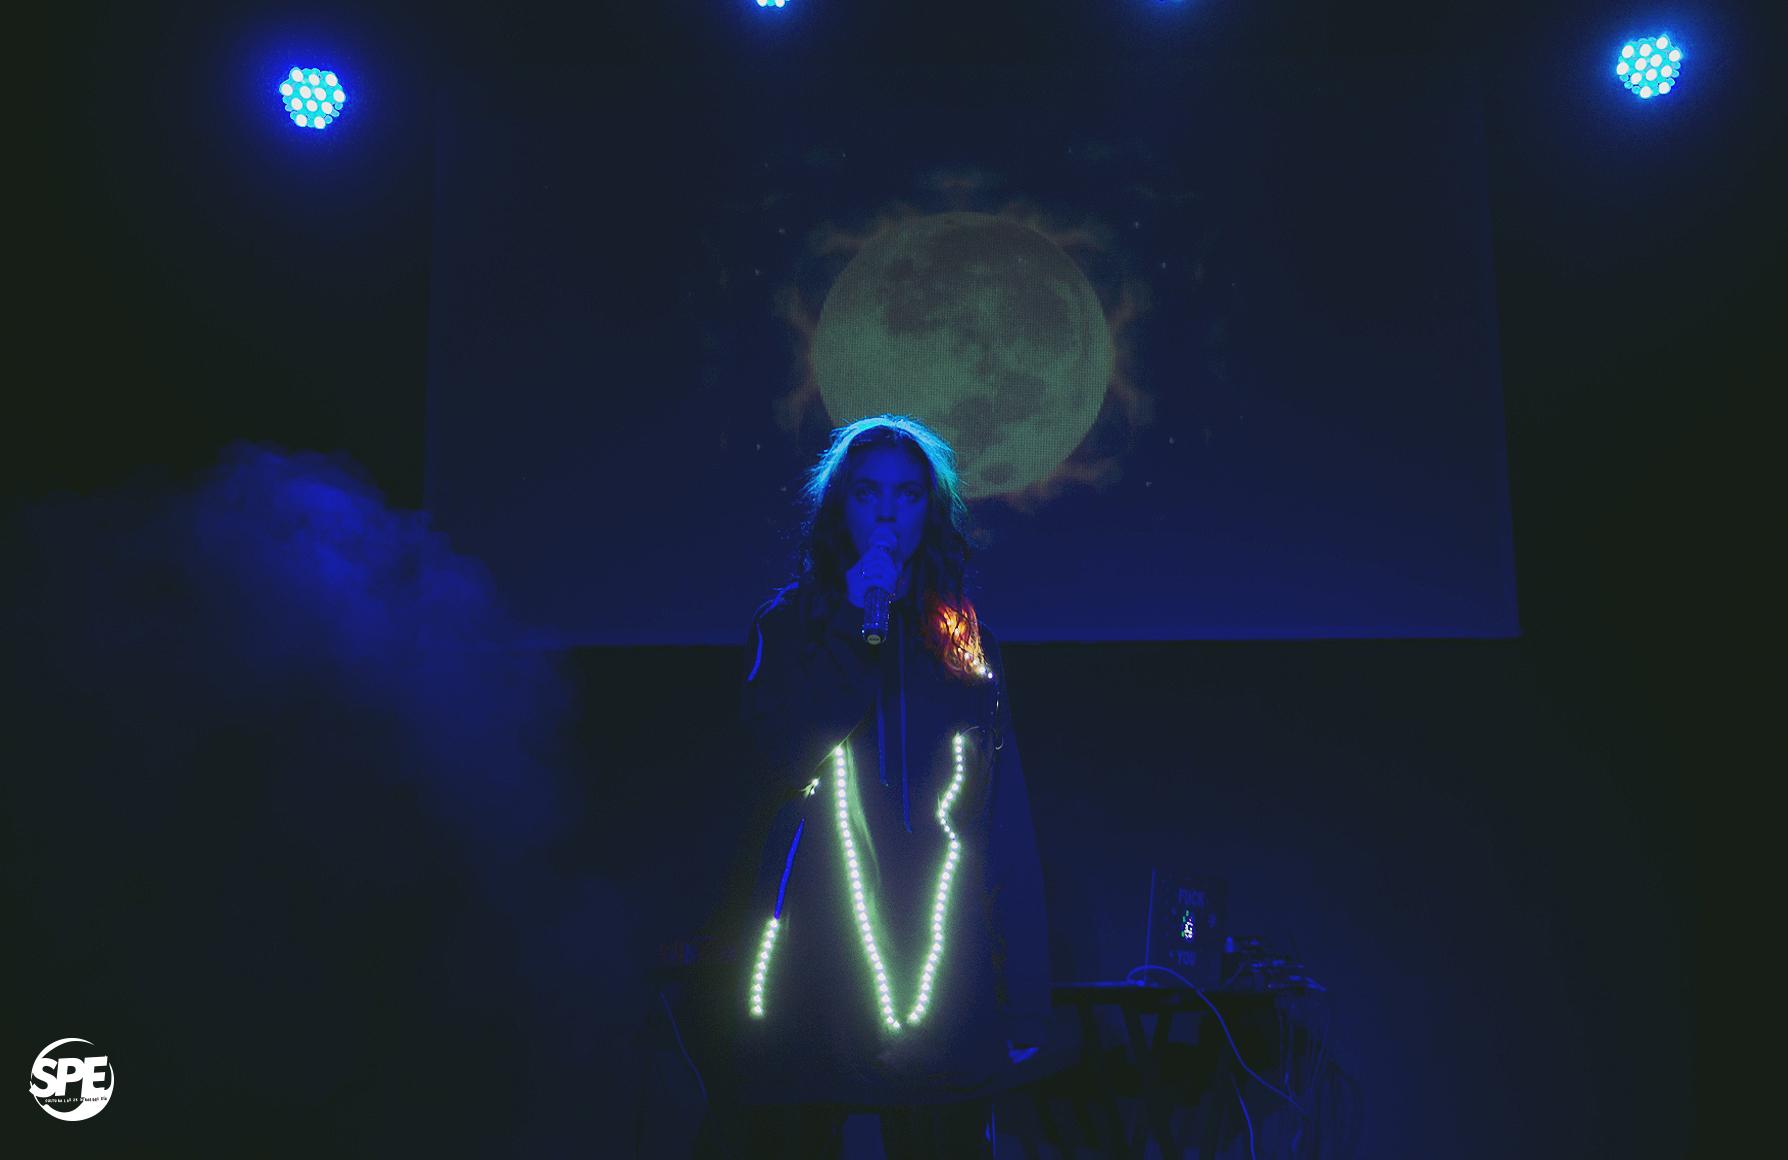 Naomi-Preizler-La-Tangente-22-Febrero-2018-Agustina-Luna-Castro09.jpg